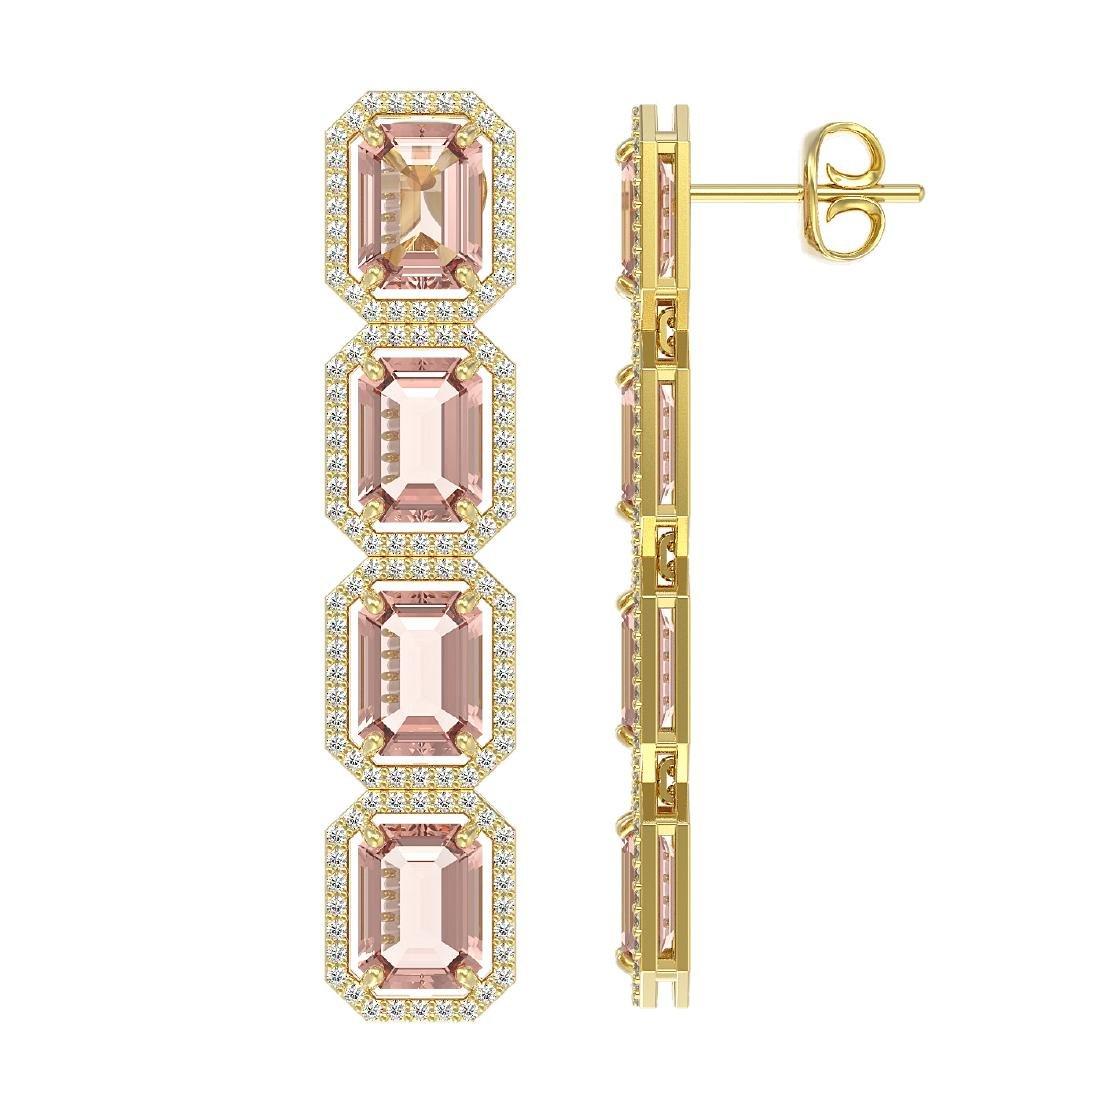 19.81 CTW Morganite & Diamond Halo Earrings 10K Yellow - 2